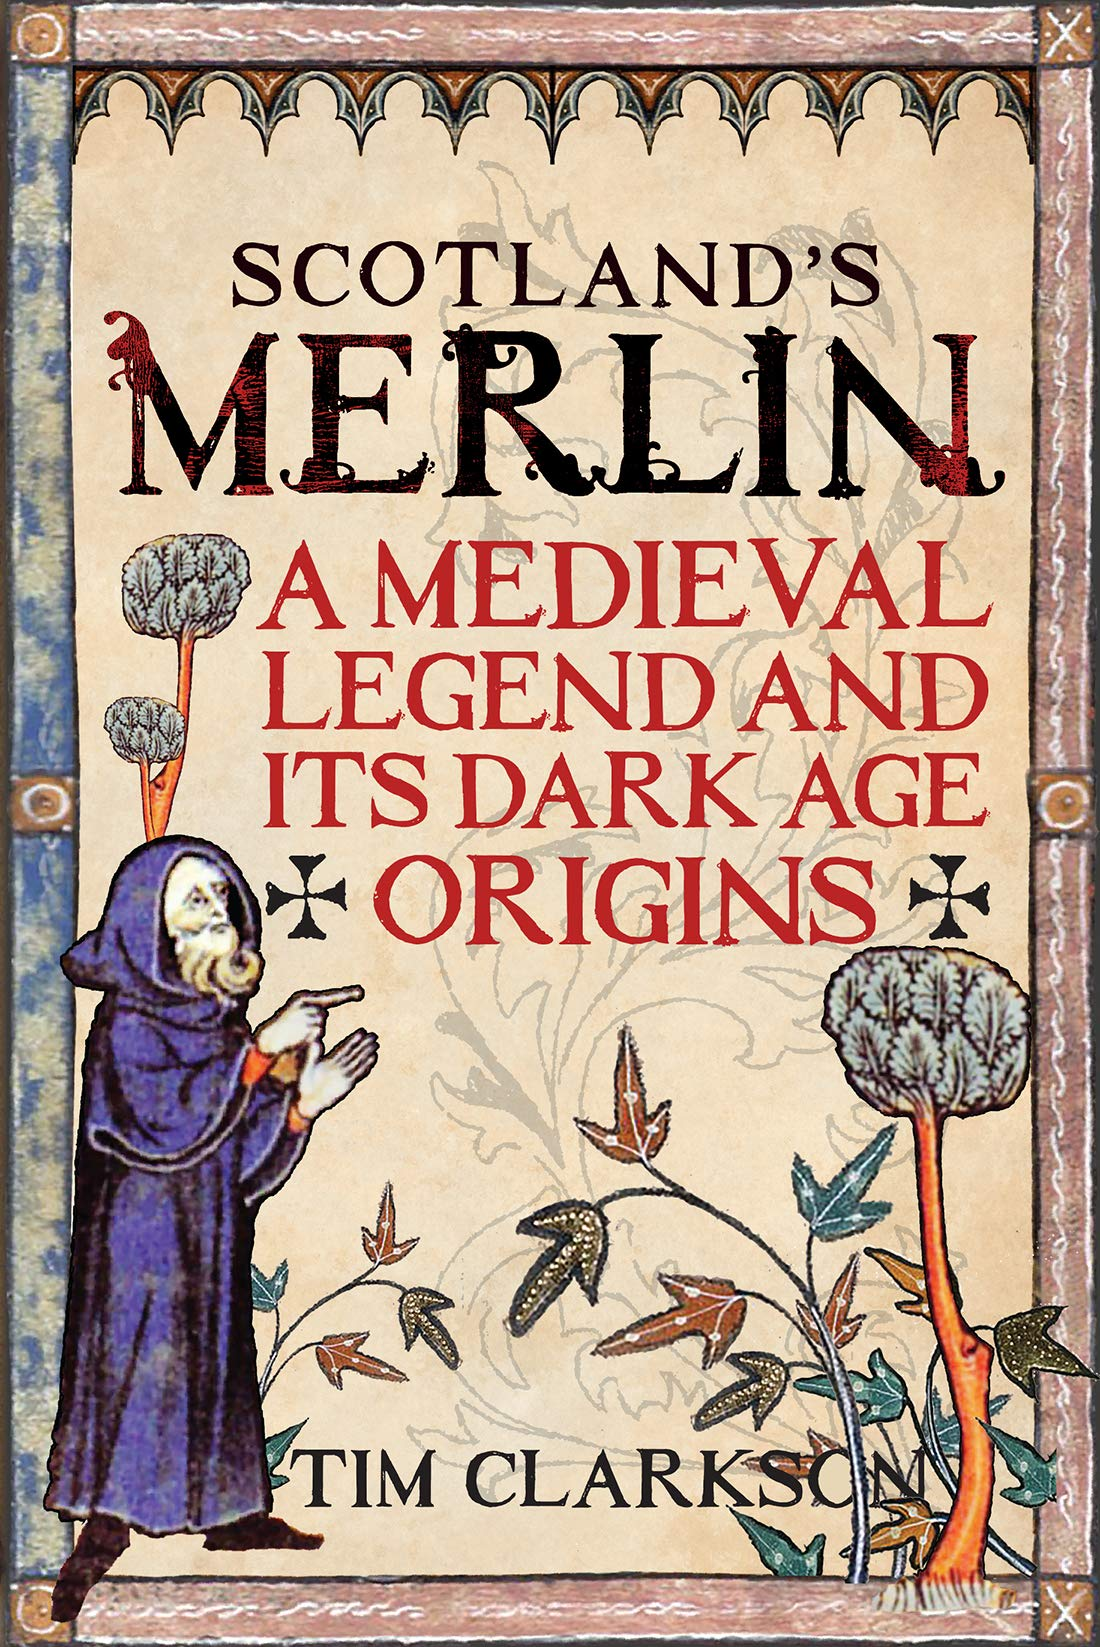 Scotland S Merlin A Medieval Legend And Its Dark Age Origins Clarkson Tim 9781906566999 Amazon Com Books